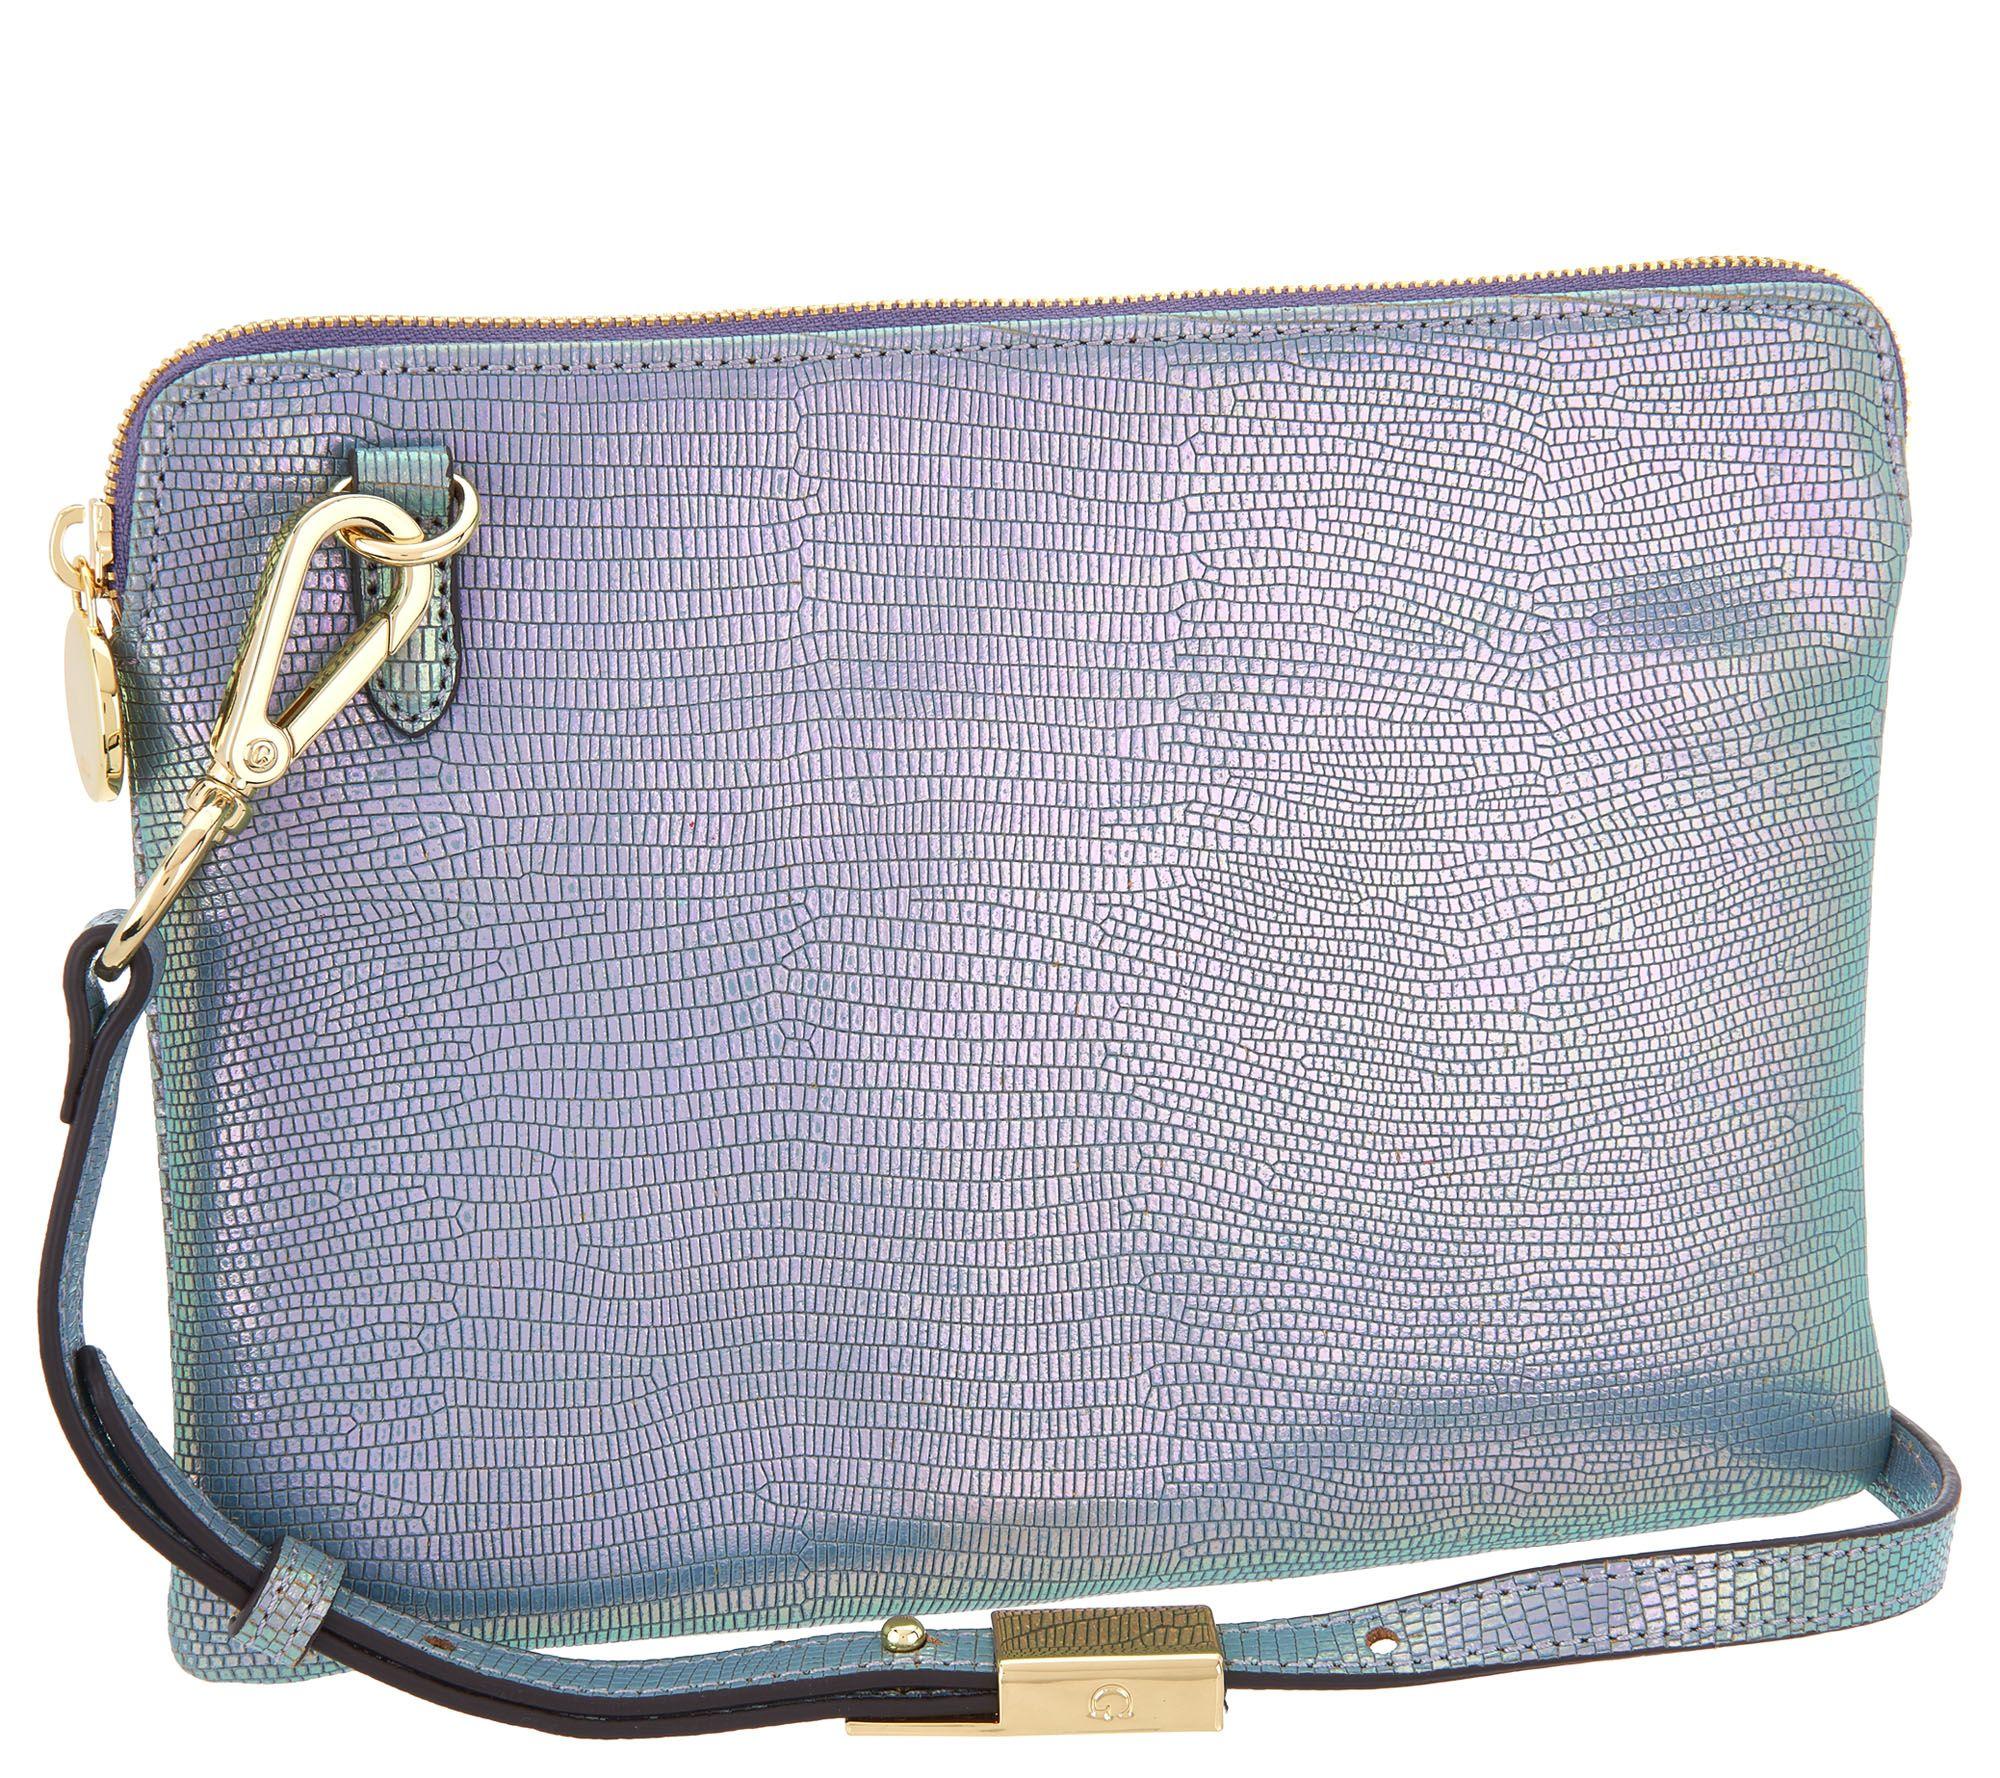 designer purse parties at home. G I L  Leather Iridescent Crossbody Pouch Handbag A301220 Handbags QVC com